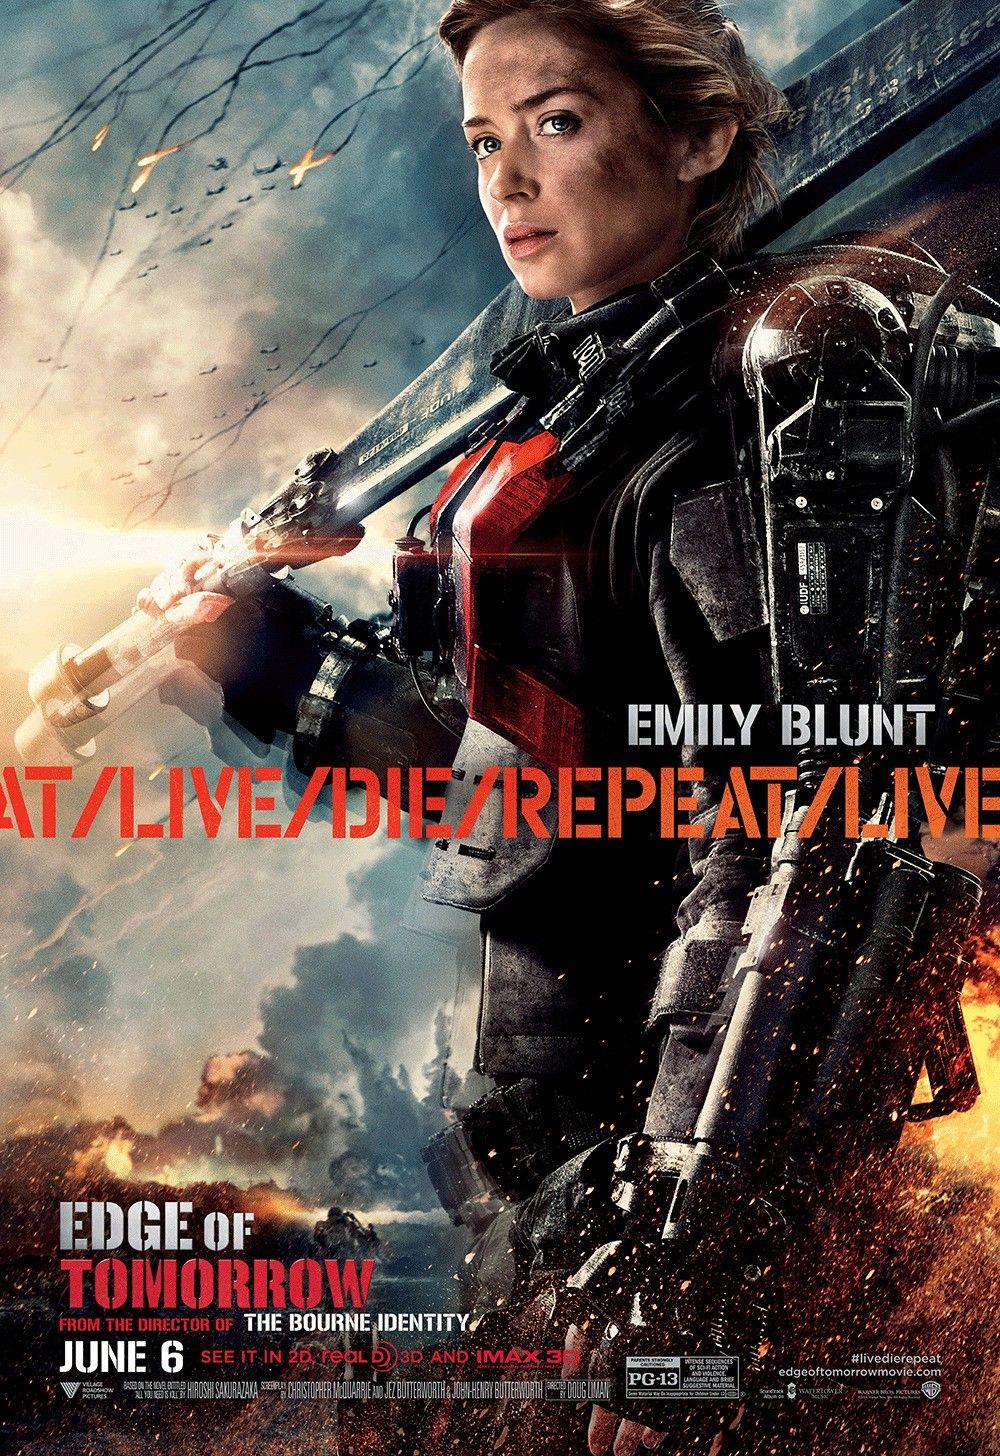 edge of tomorrow full movie watch online free